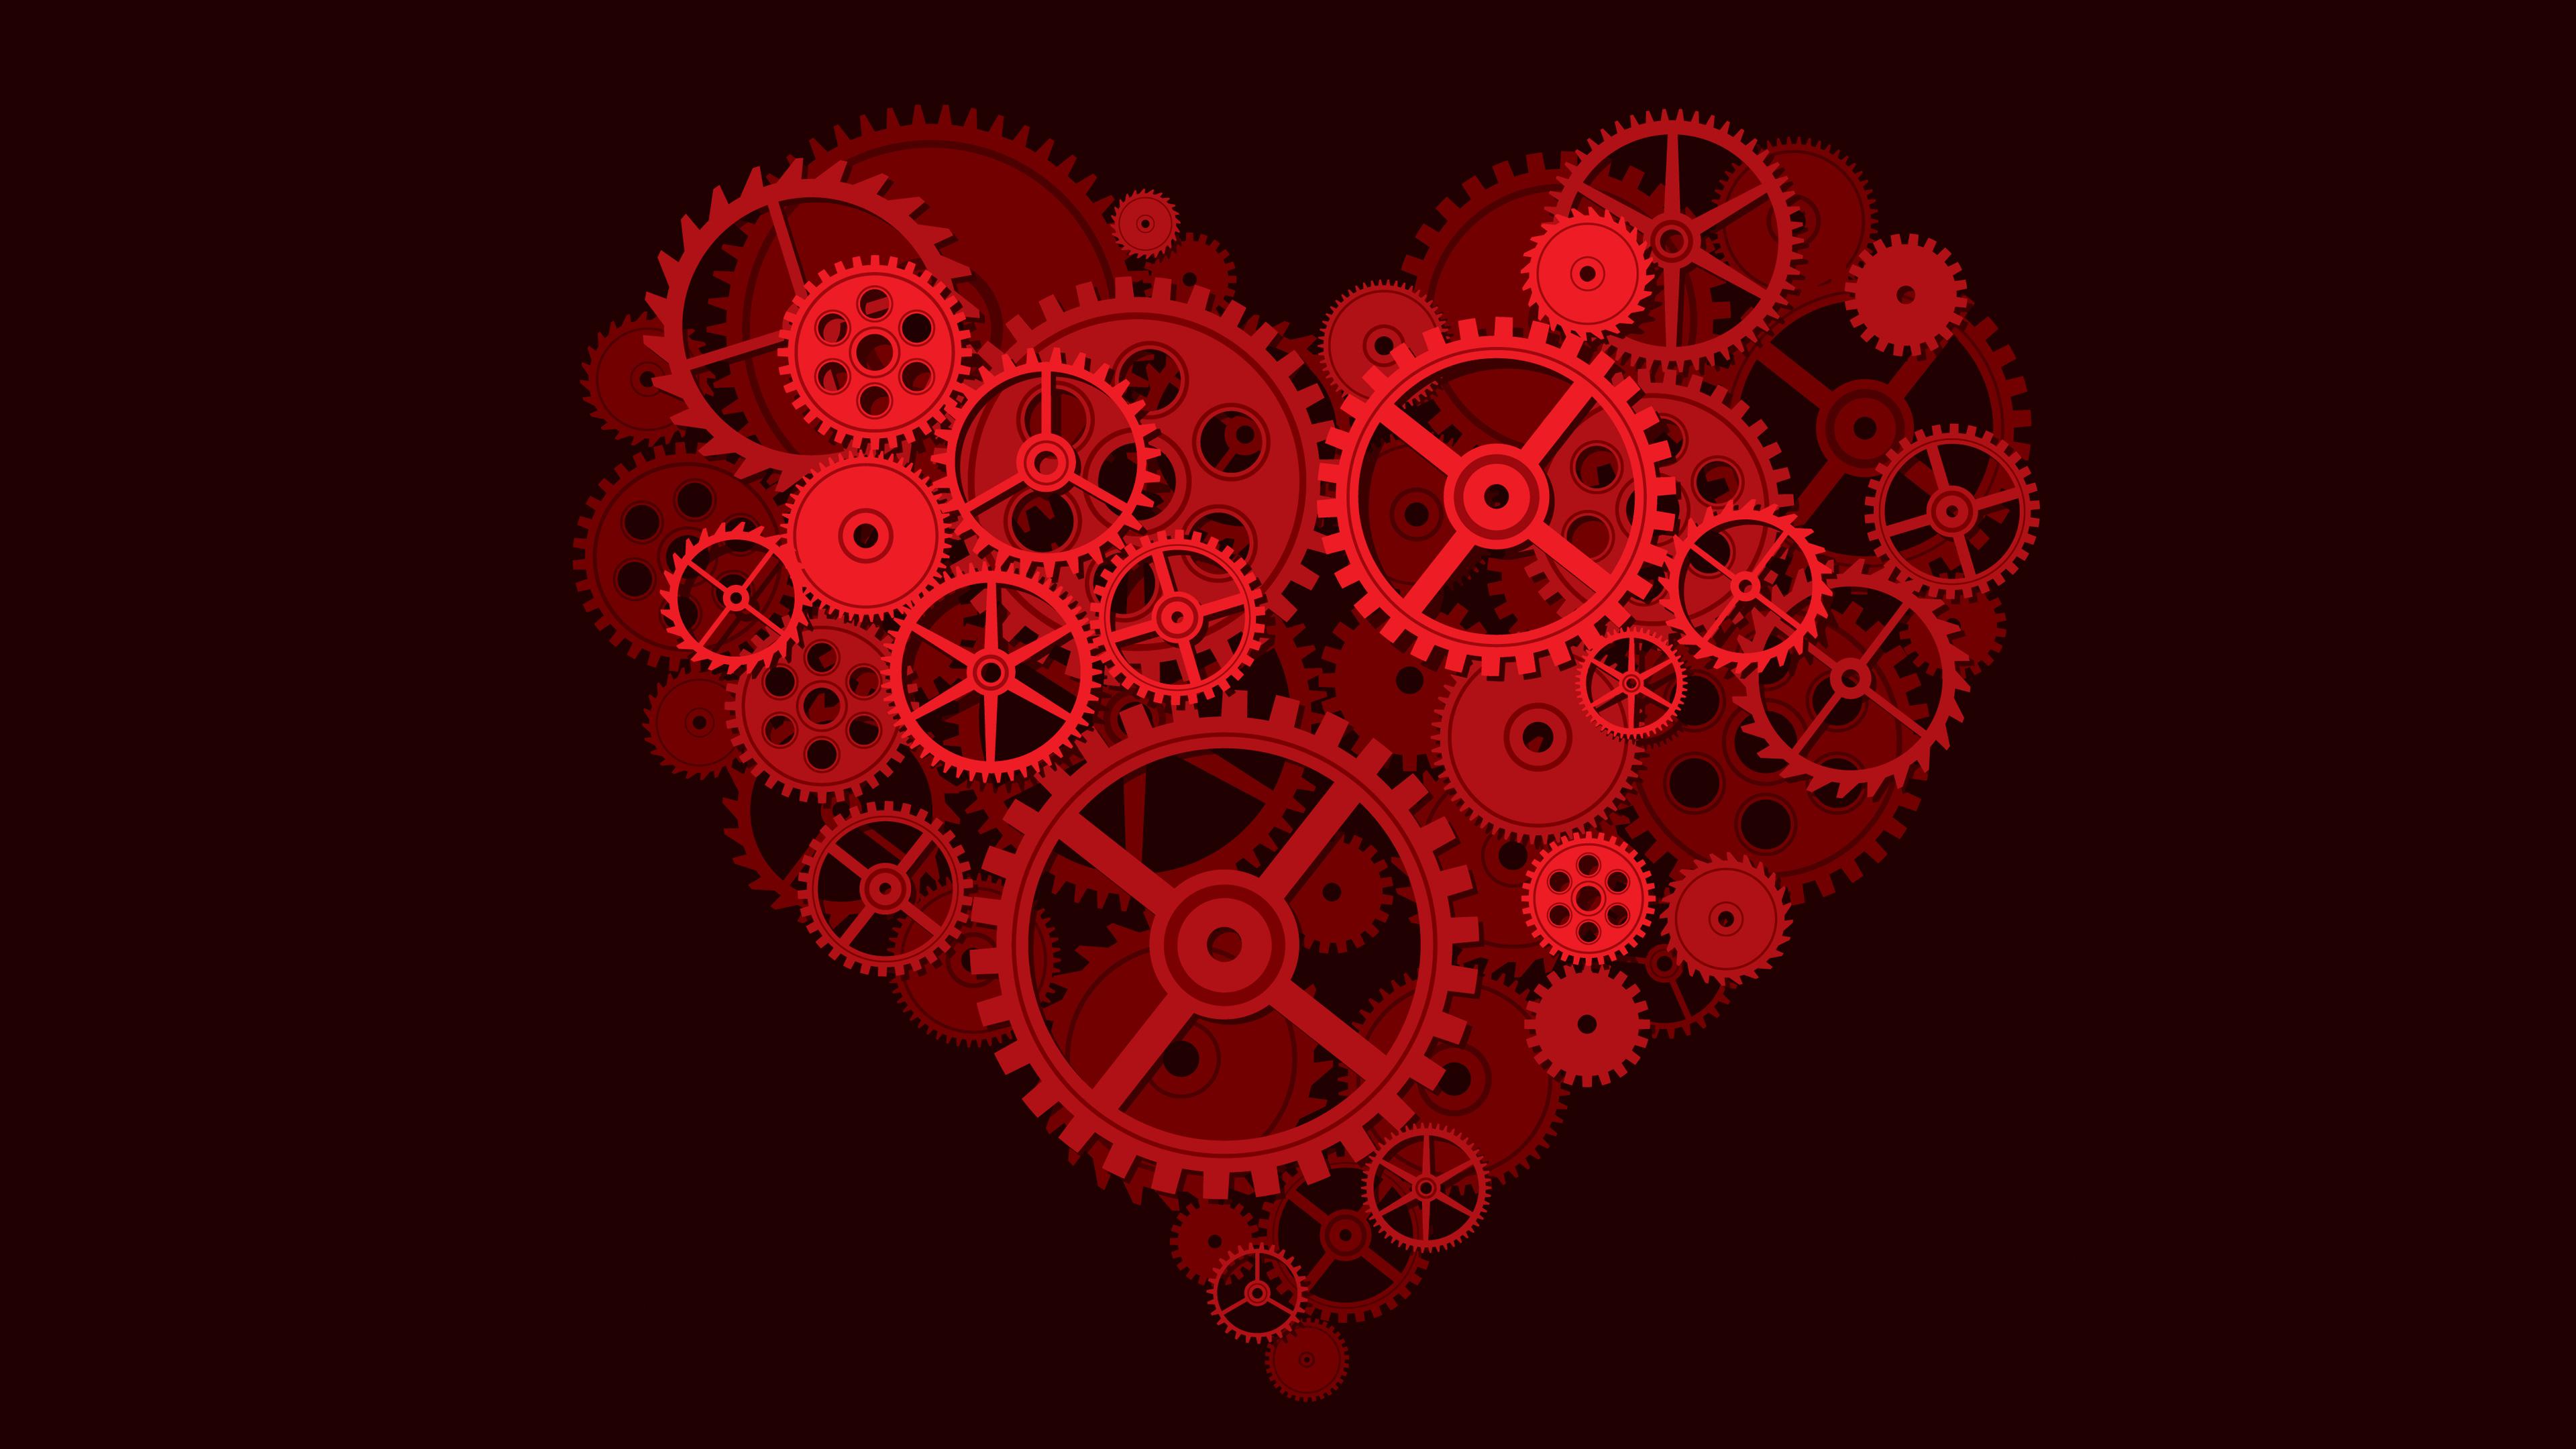 heart-digital-art-4k-l8.jpg